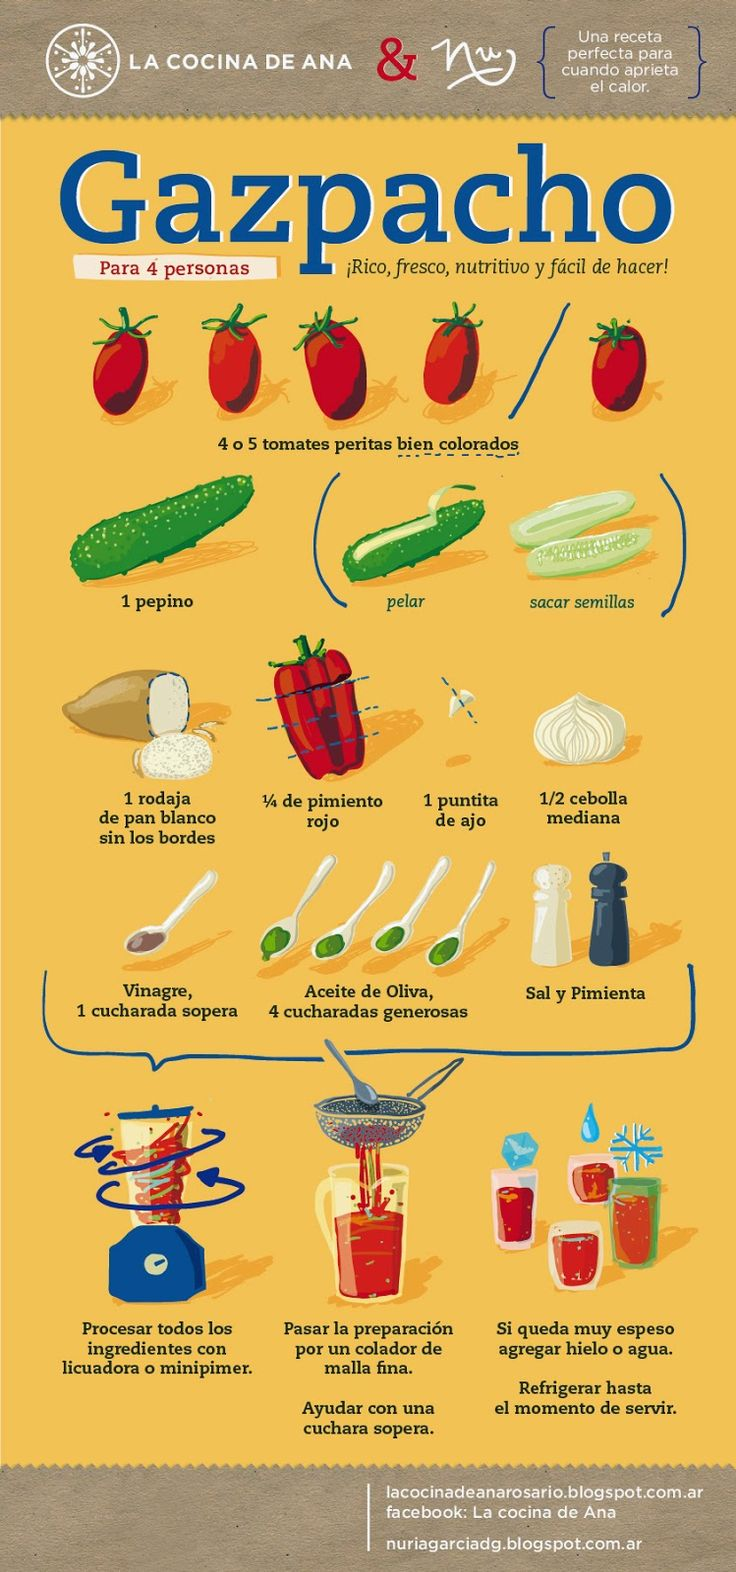 Gazpacho_La-Cocina-de-Ana.jpg 749×1,600 pixeles